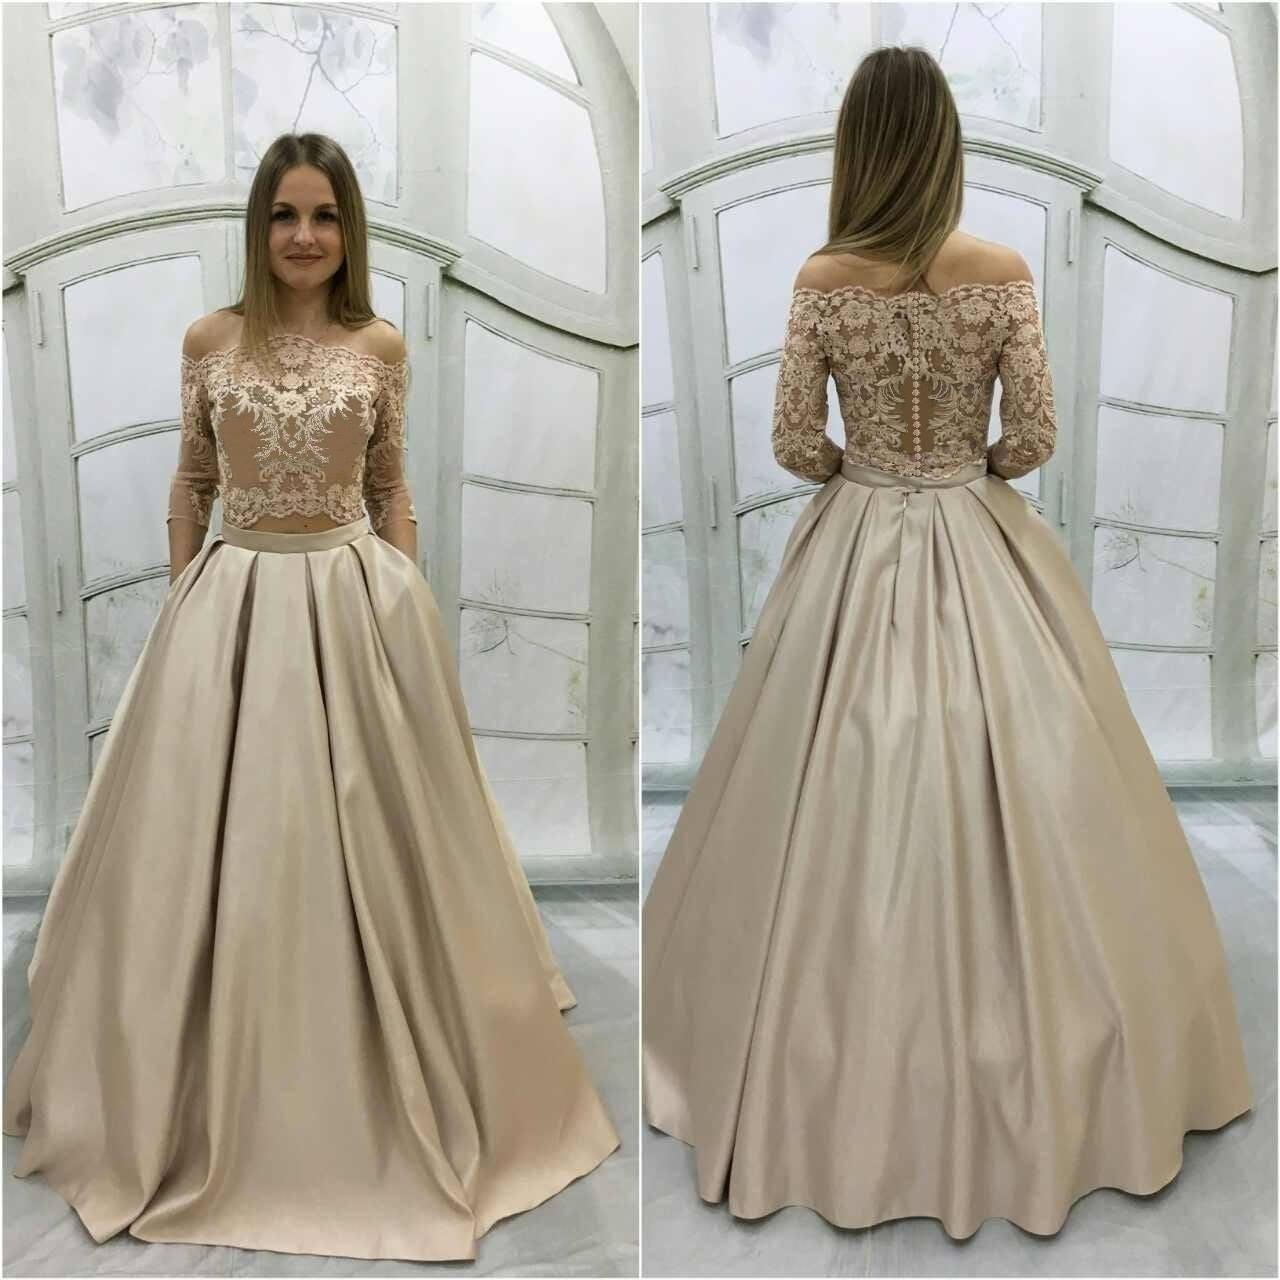 Beige wedding dressVintage Atlas Wedding Dress with Lace